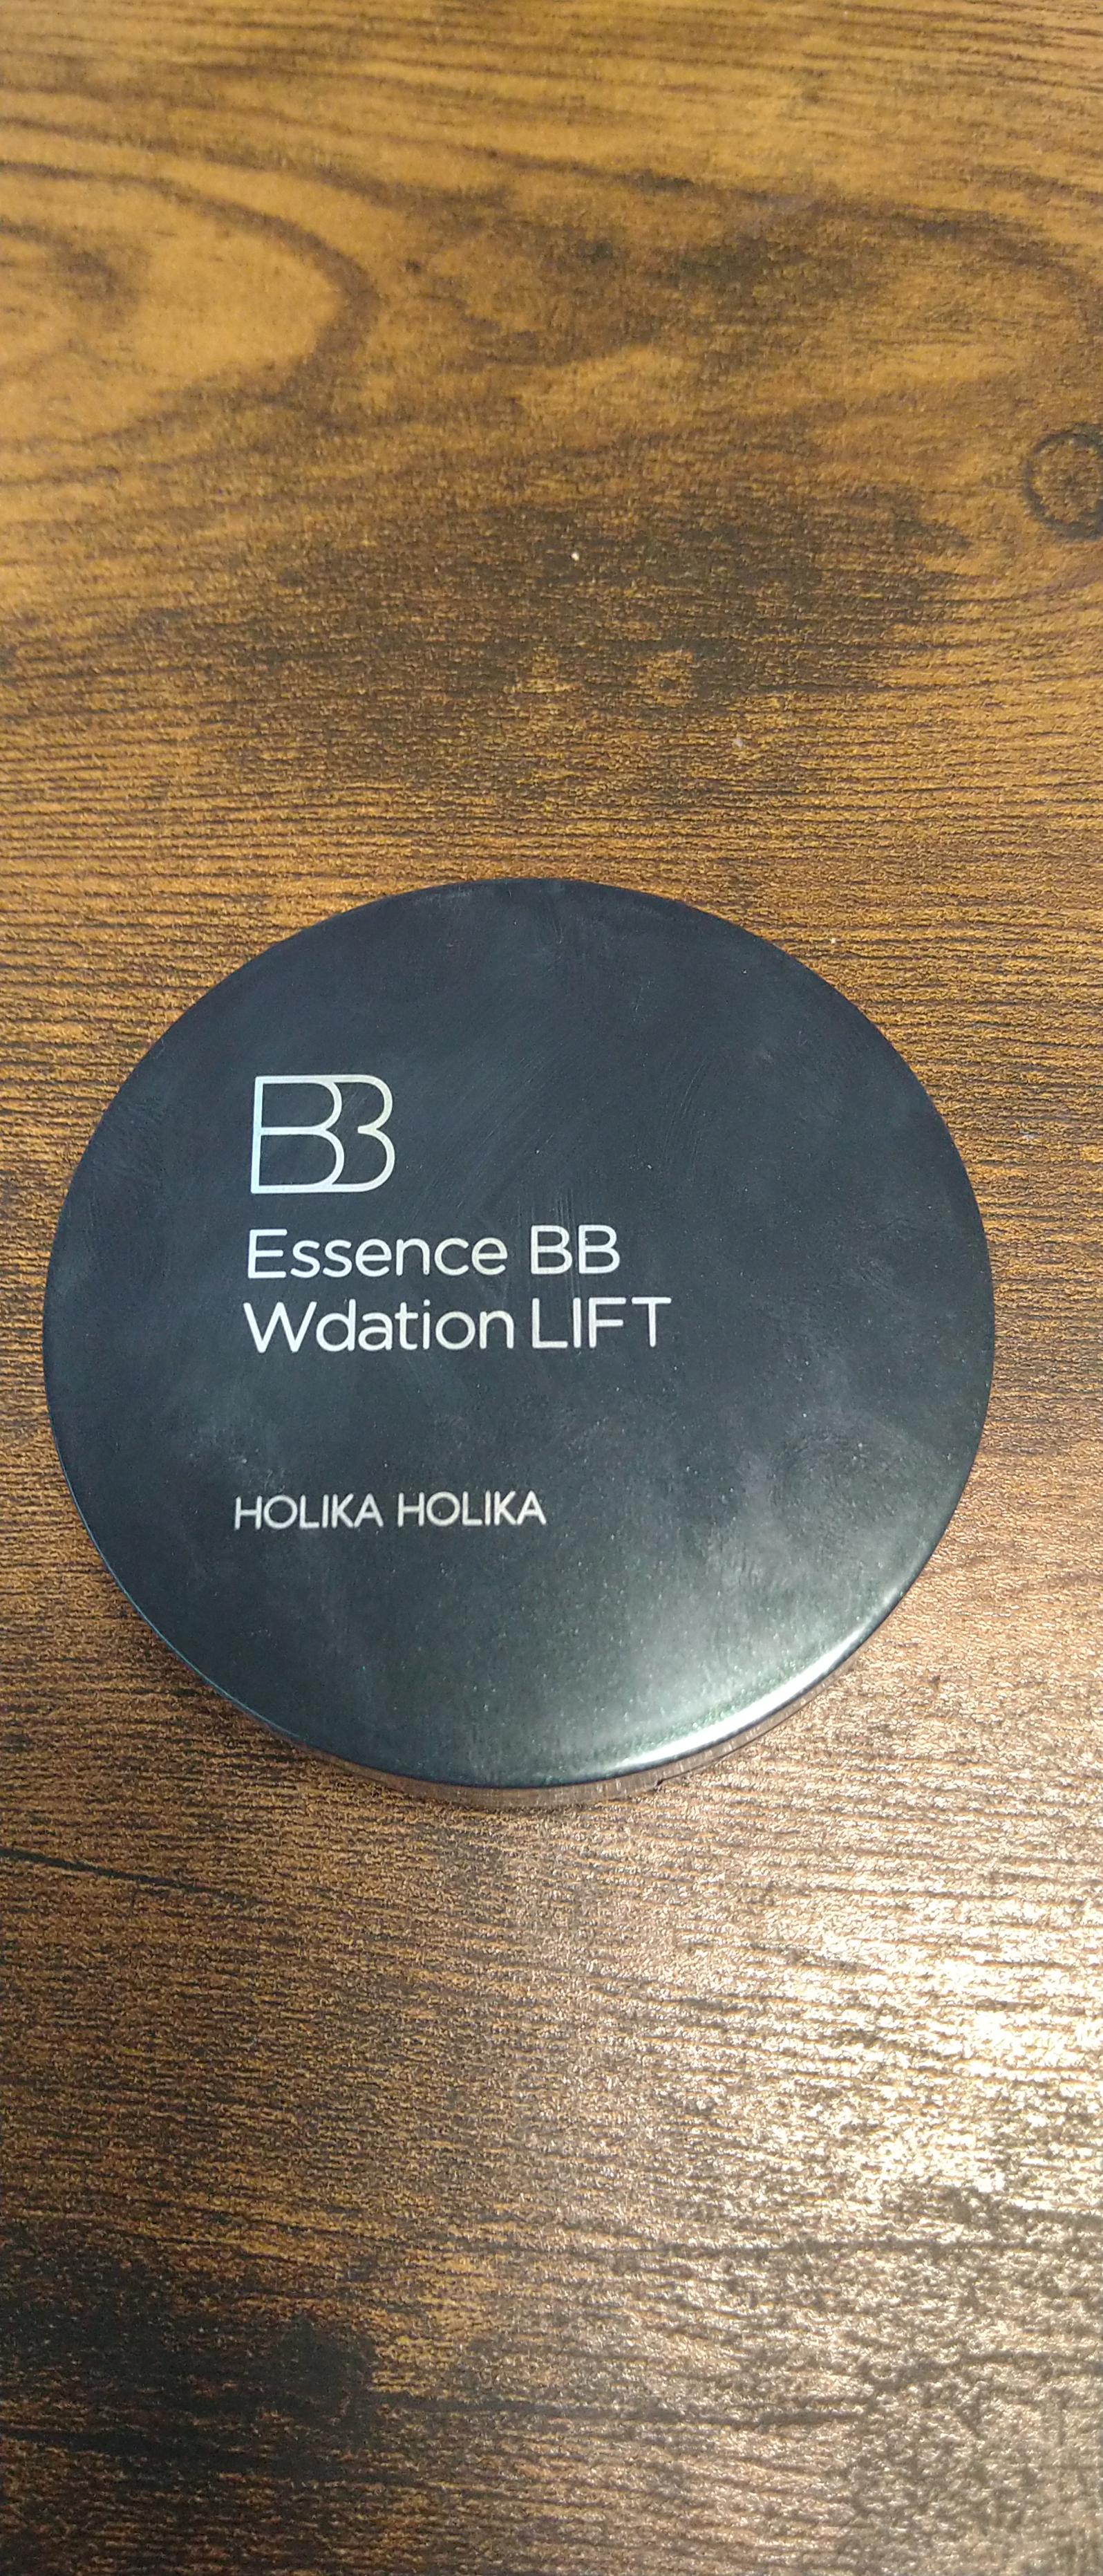 HOLIKA HOLIKA(ホリカホリカ) エッセンスBB Wデーション リフトの良い点・メリットに関するしよりんさんの口コミ画像1